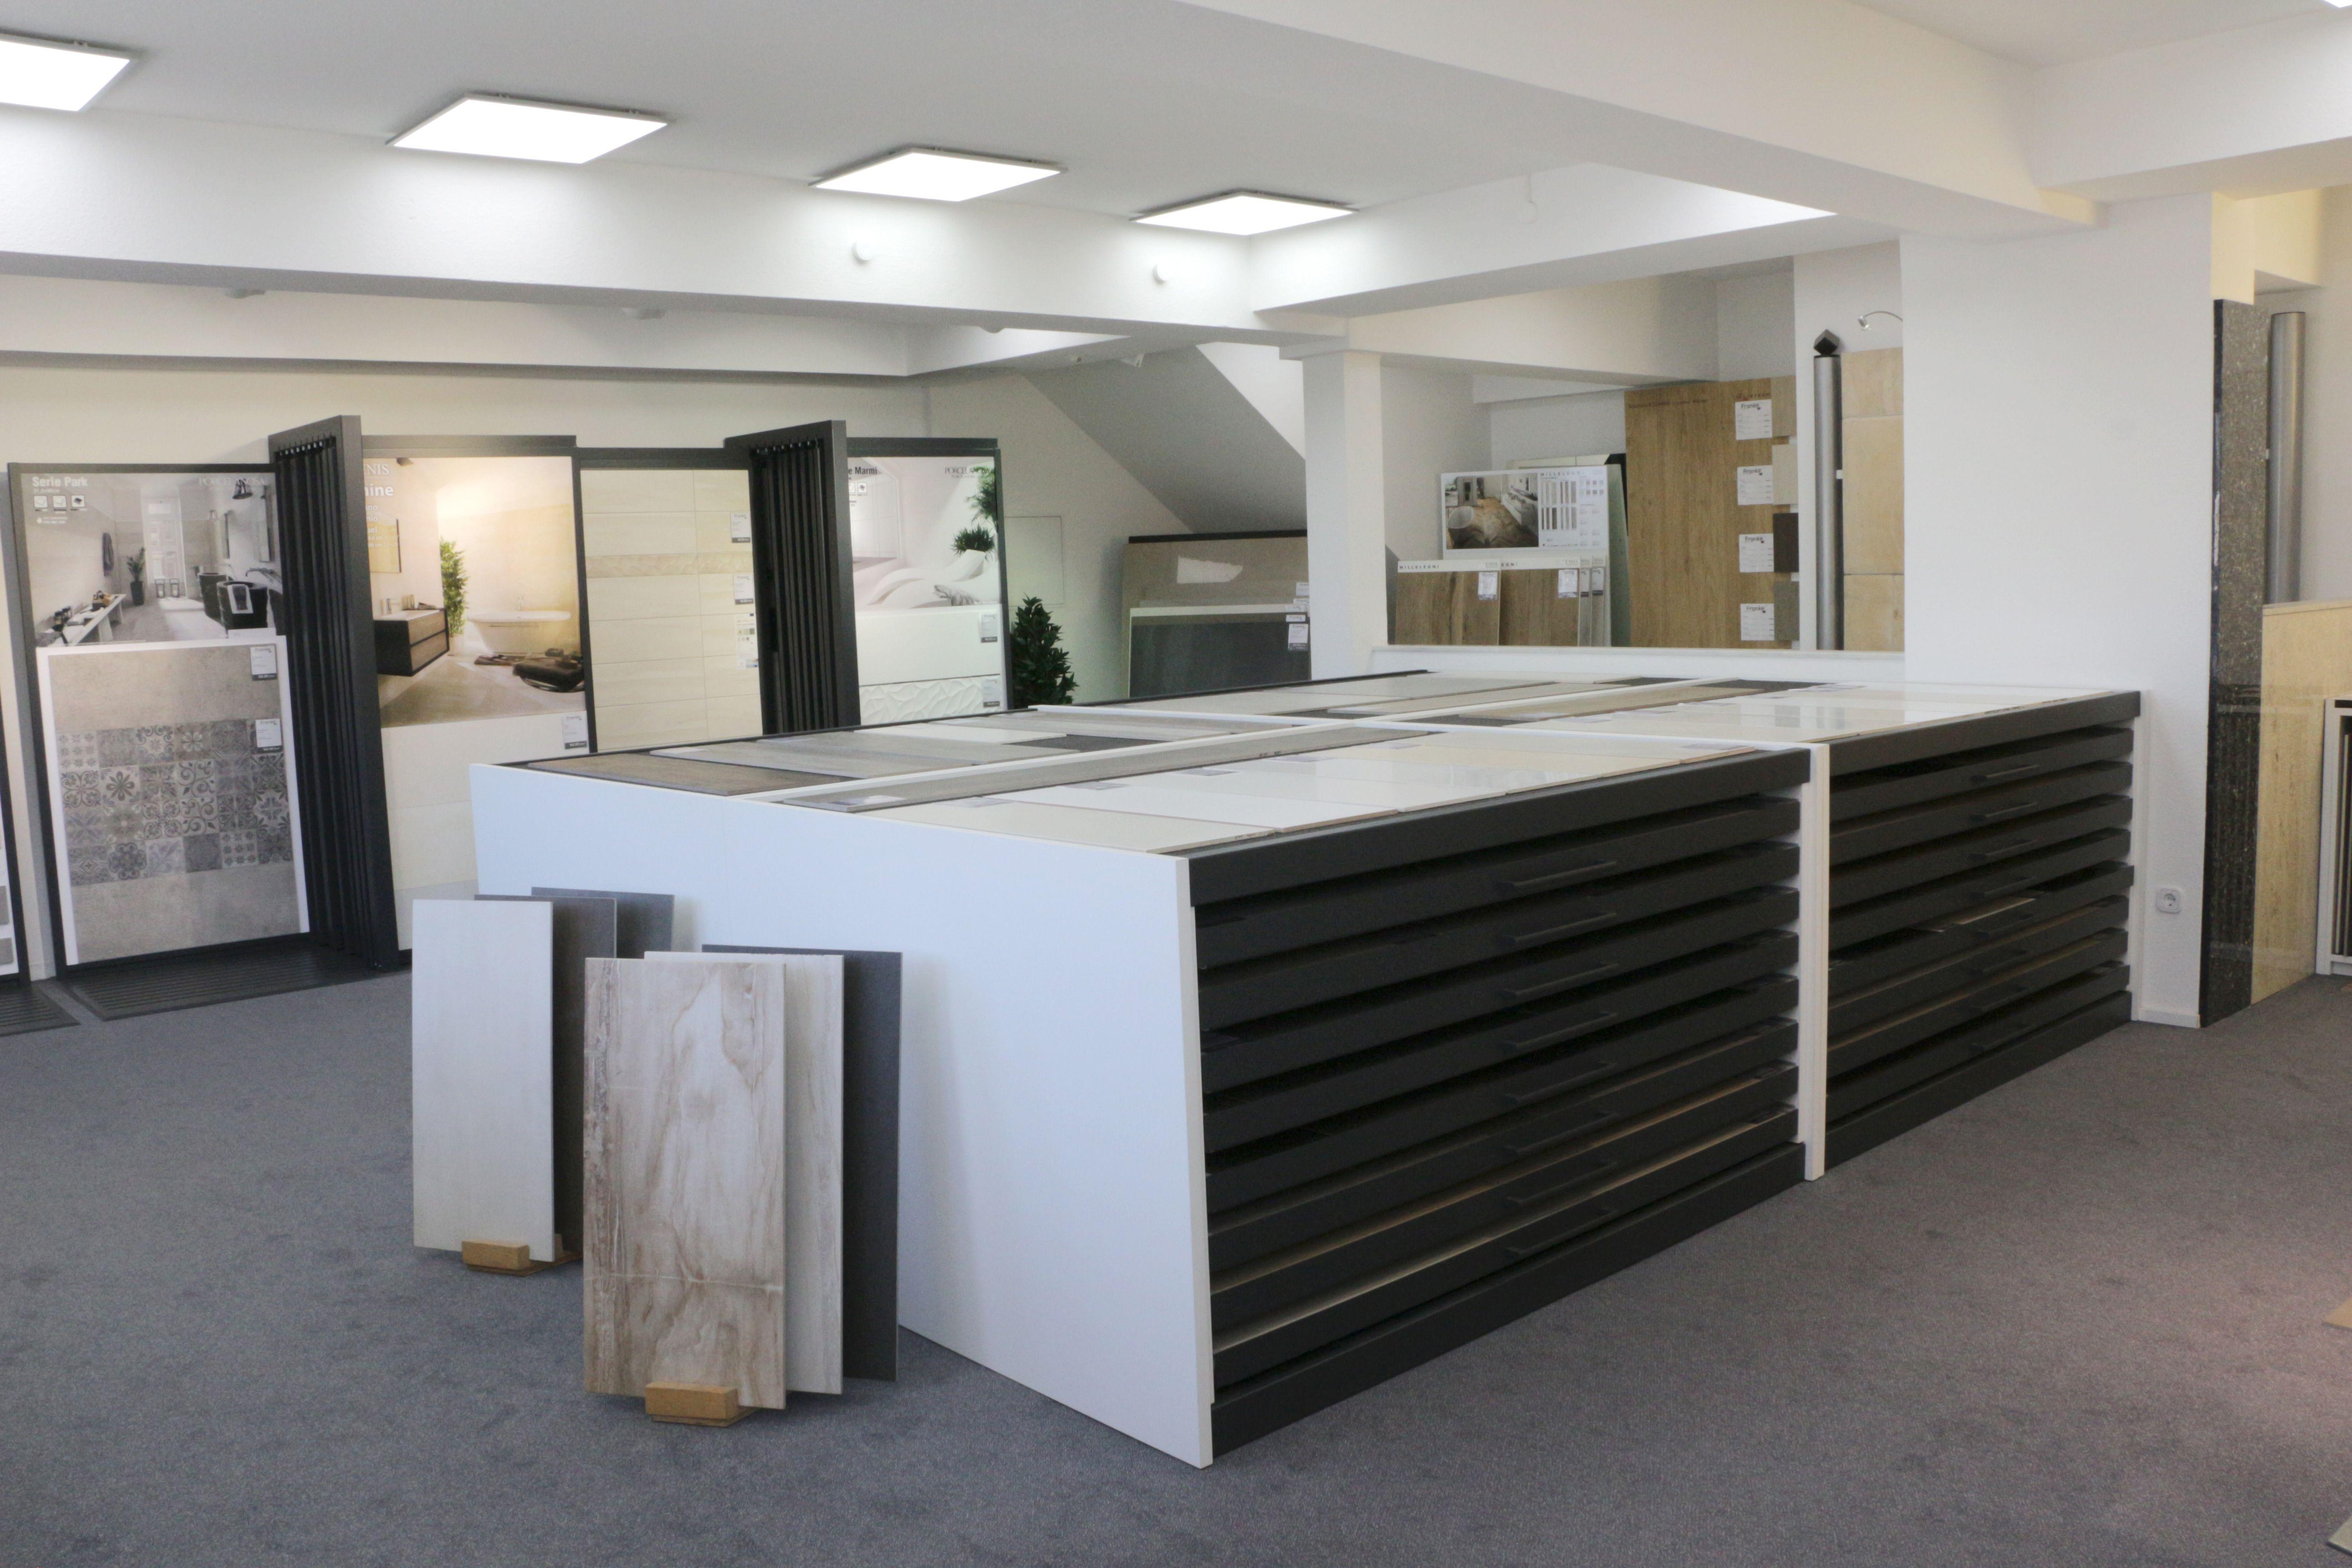 XXL-Studio - Fliesen im Großformat www.franke-raumwert.de #tiles #Fliesen #großformat